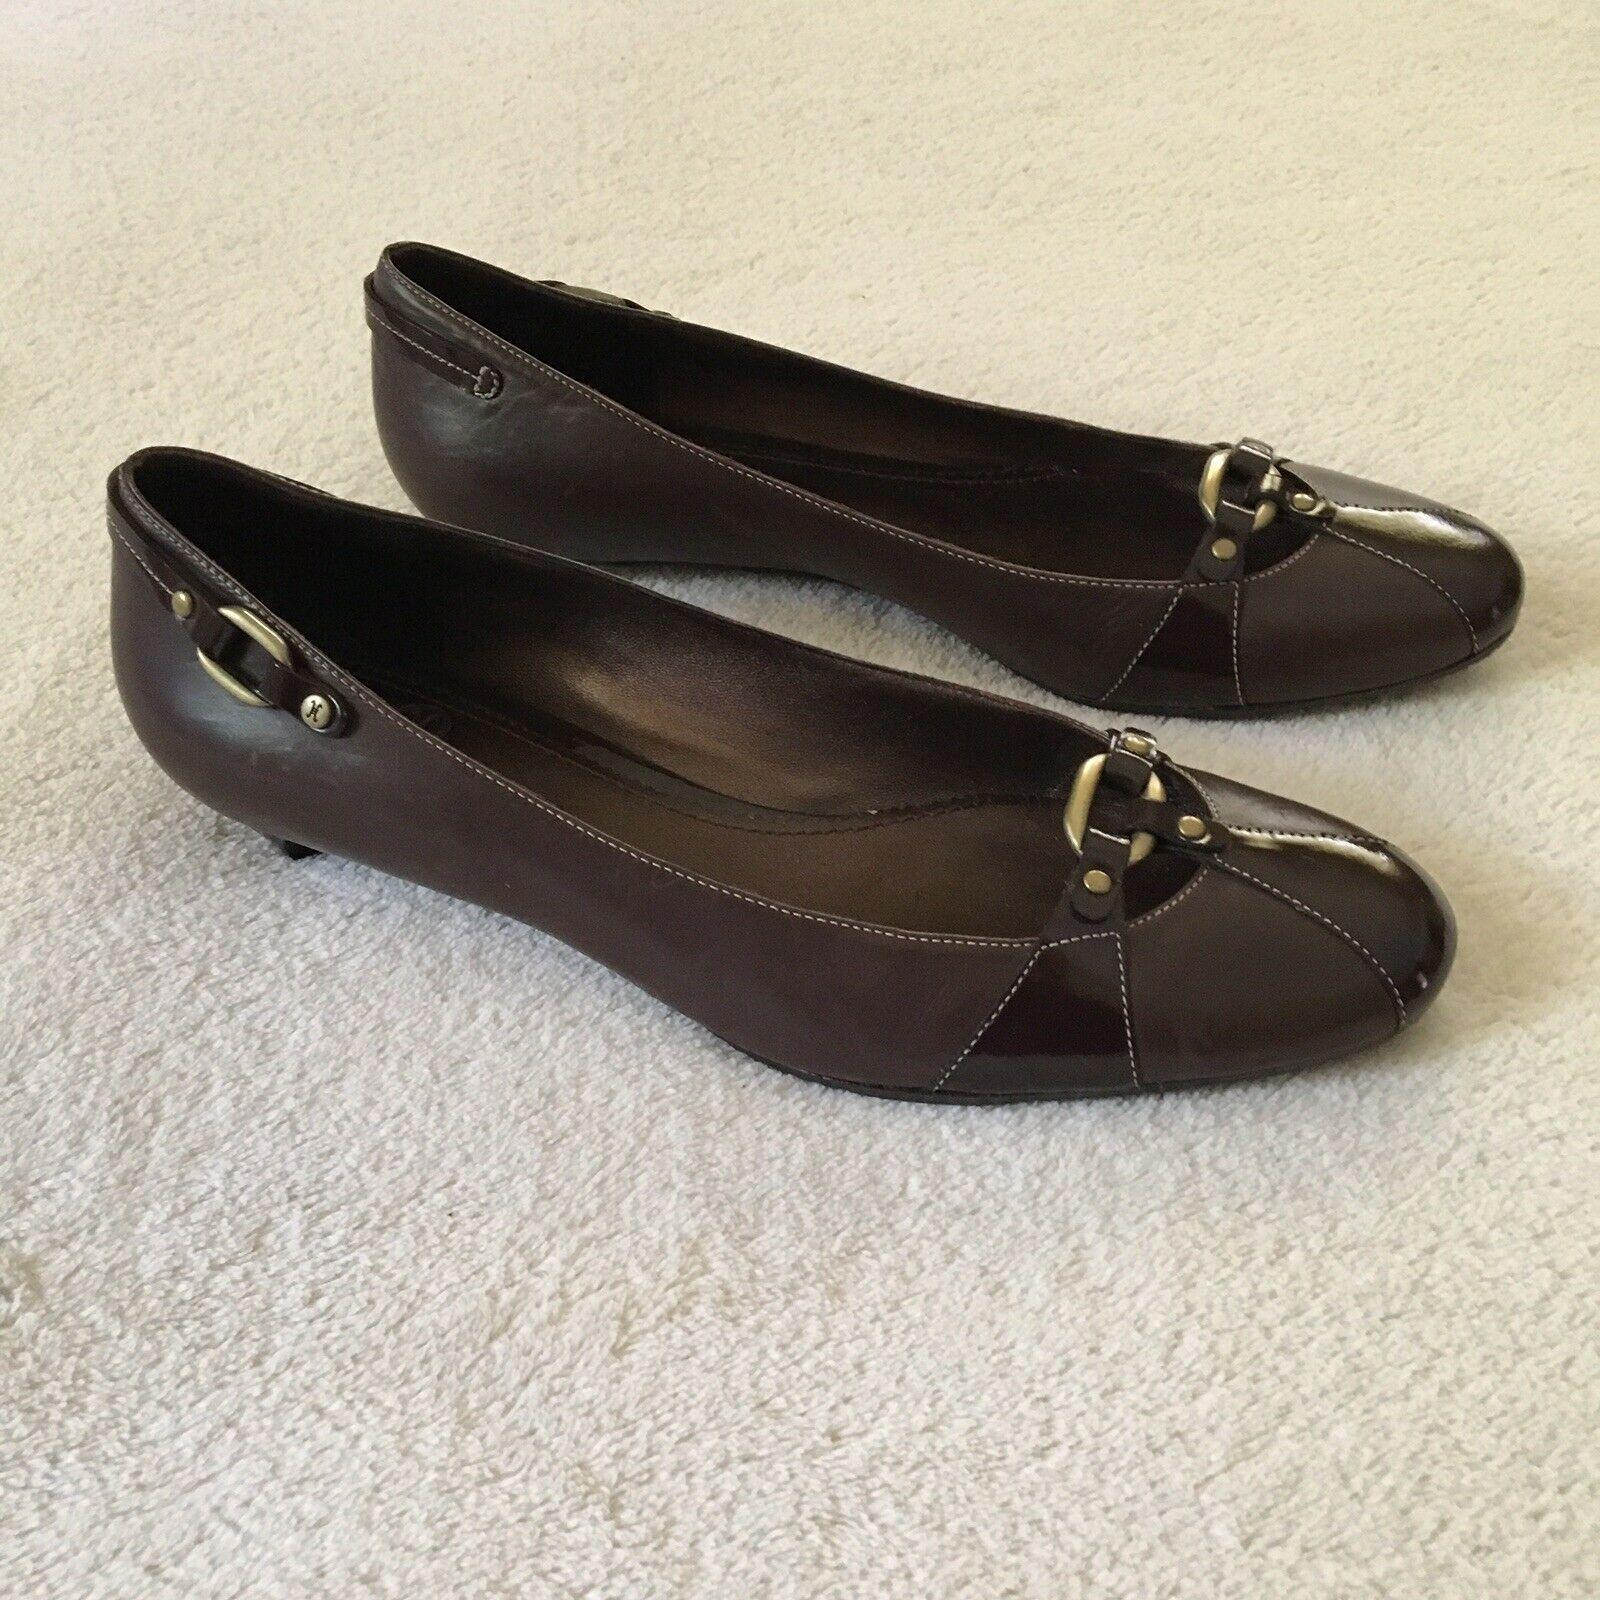 Cole Haan Shoes Womens Size 7.5 B Brown Low Heel